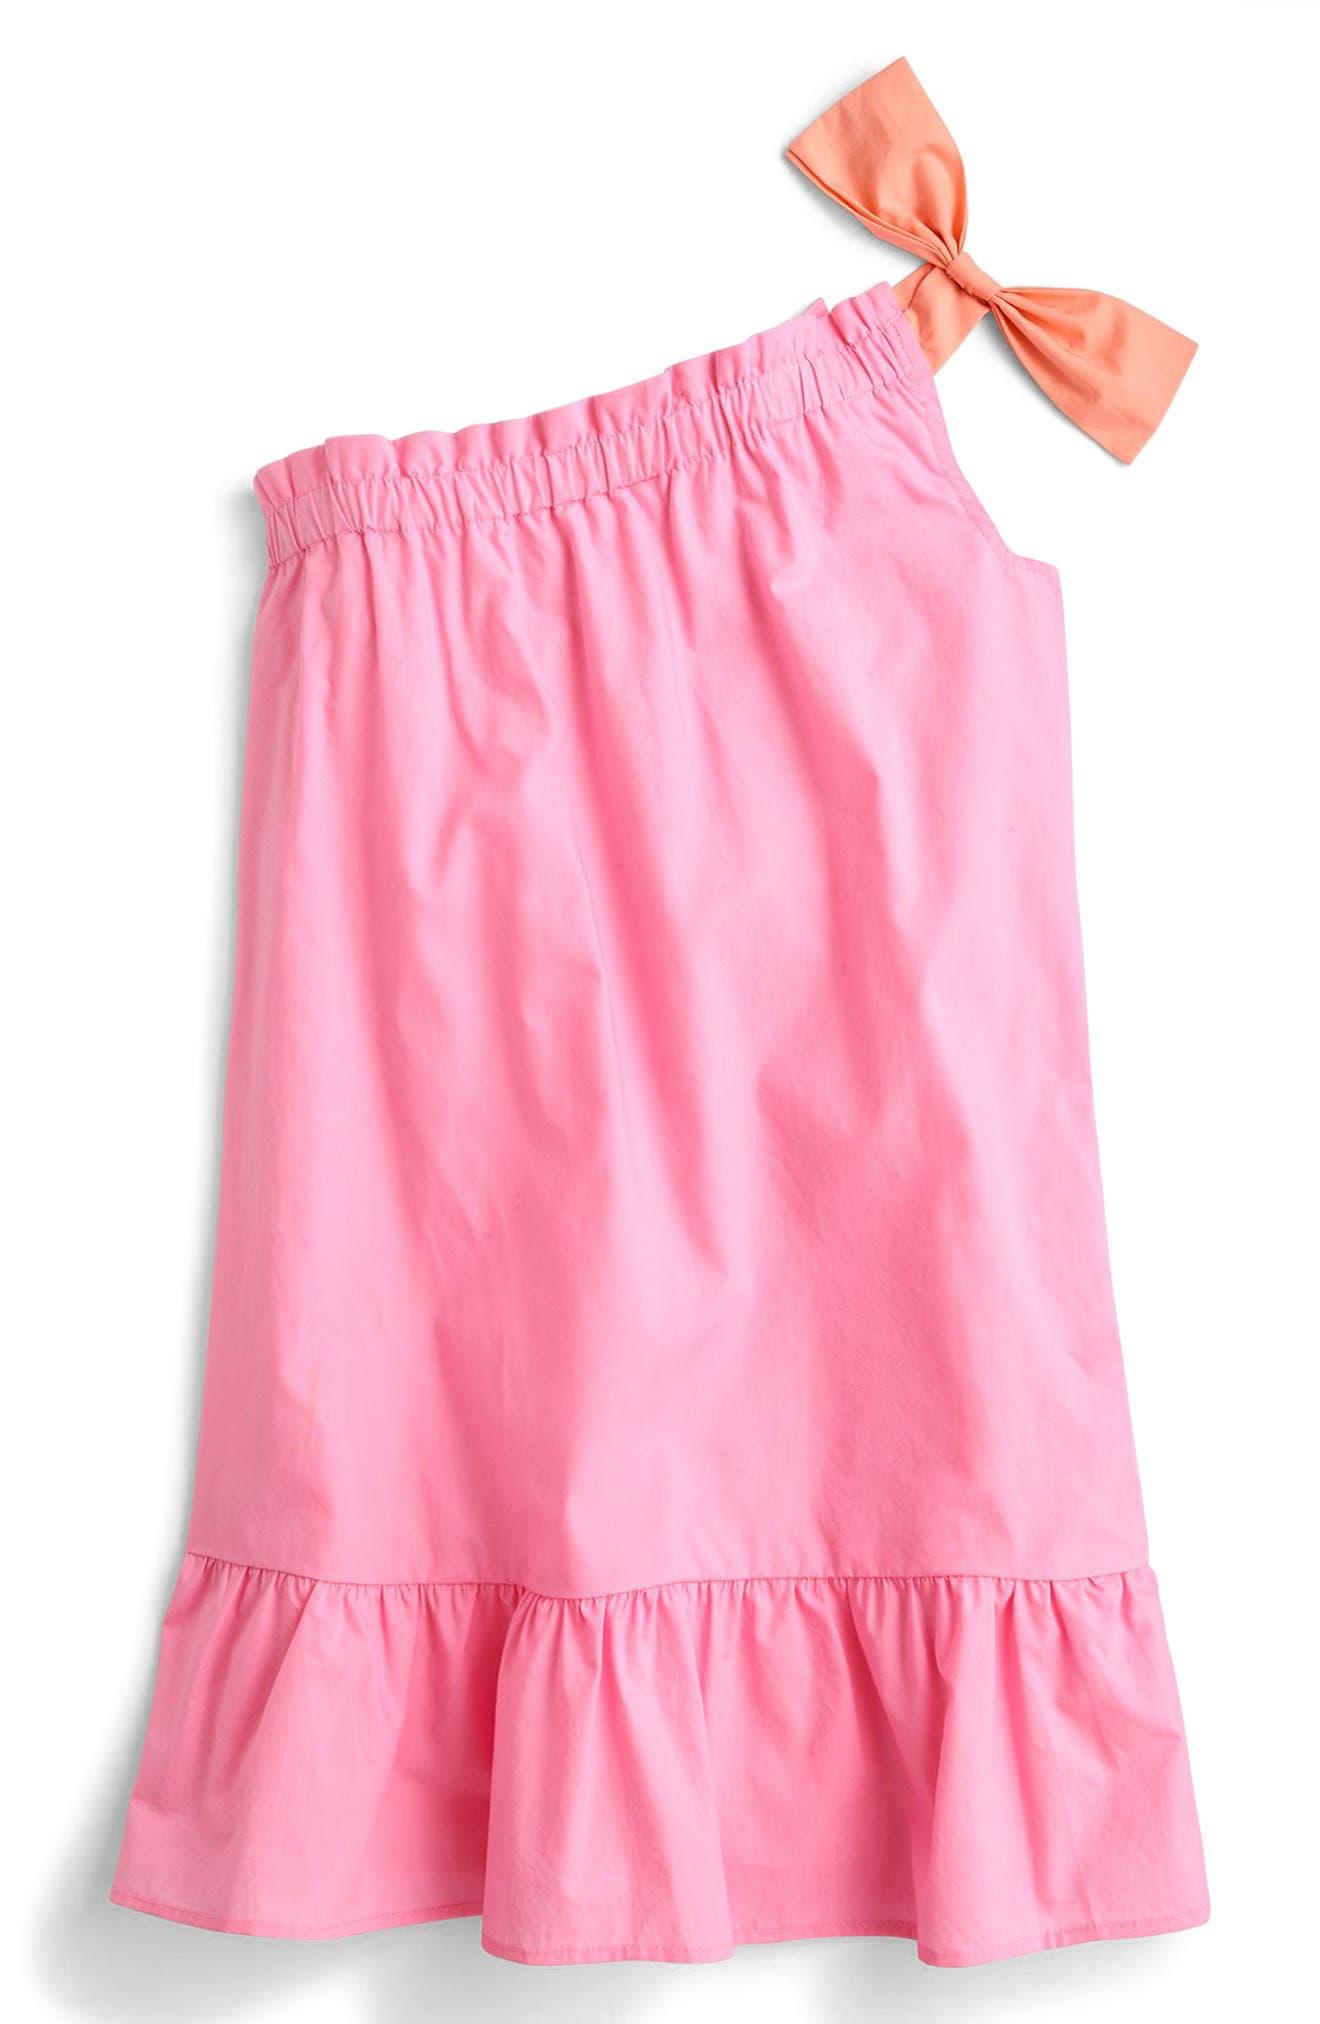 Calpurnia One-Shoulder Dress,                             Main thumbnail 1, color,                             Neon Bubblegum Pk5446